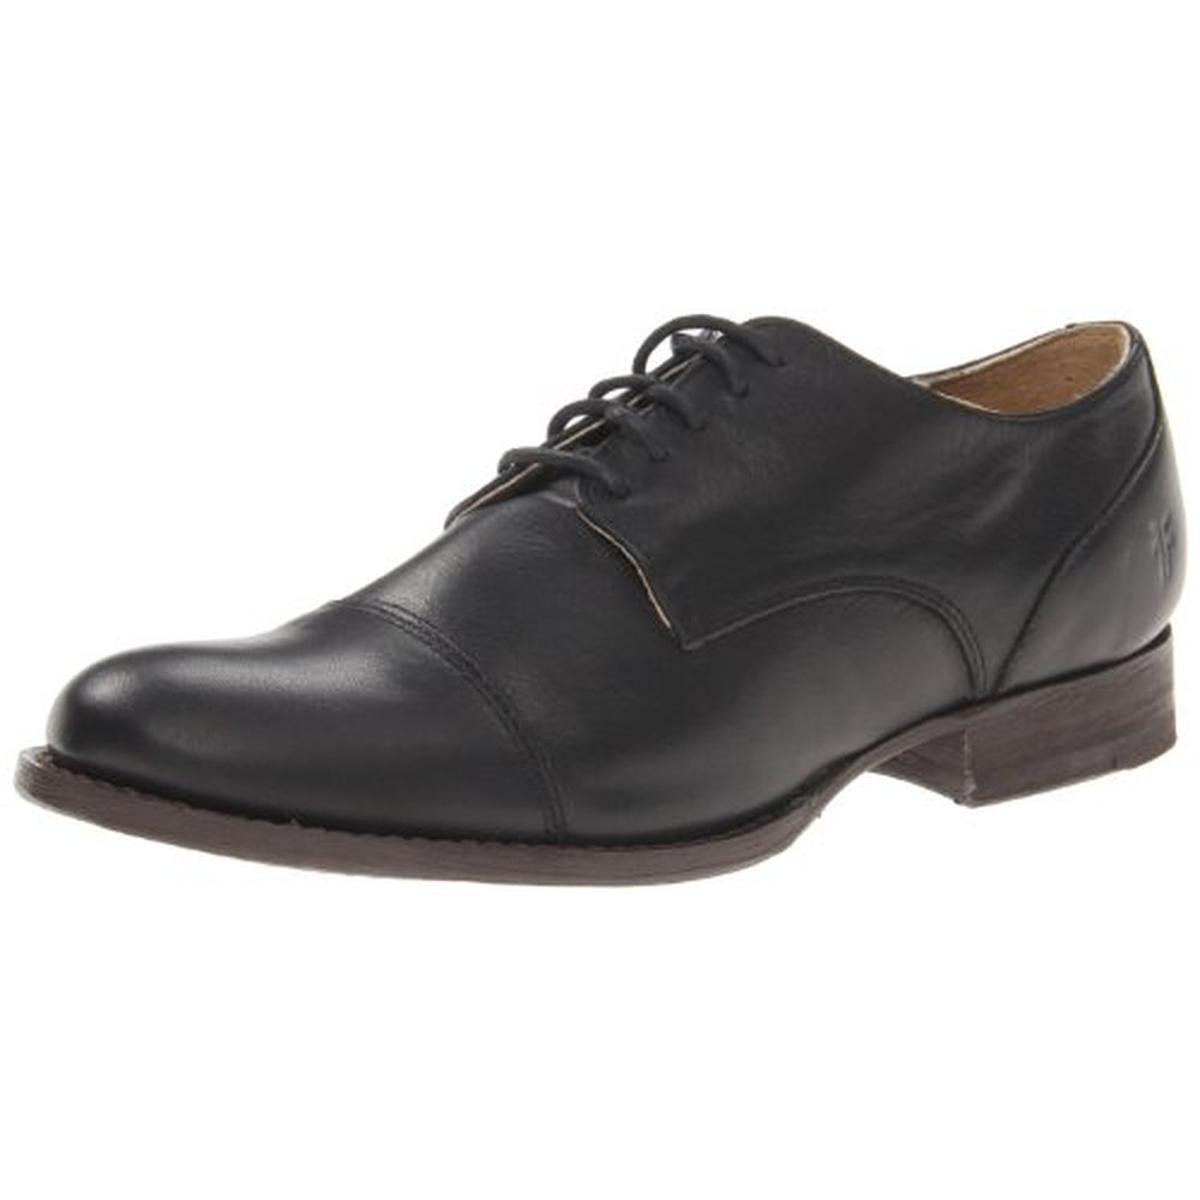 Frye Womes Shoes Uk